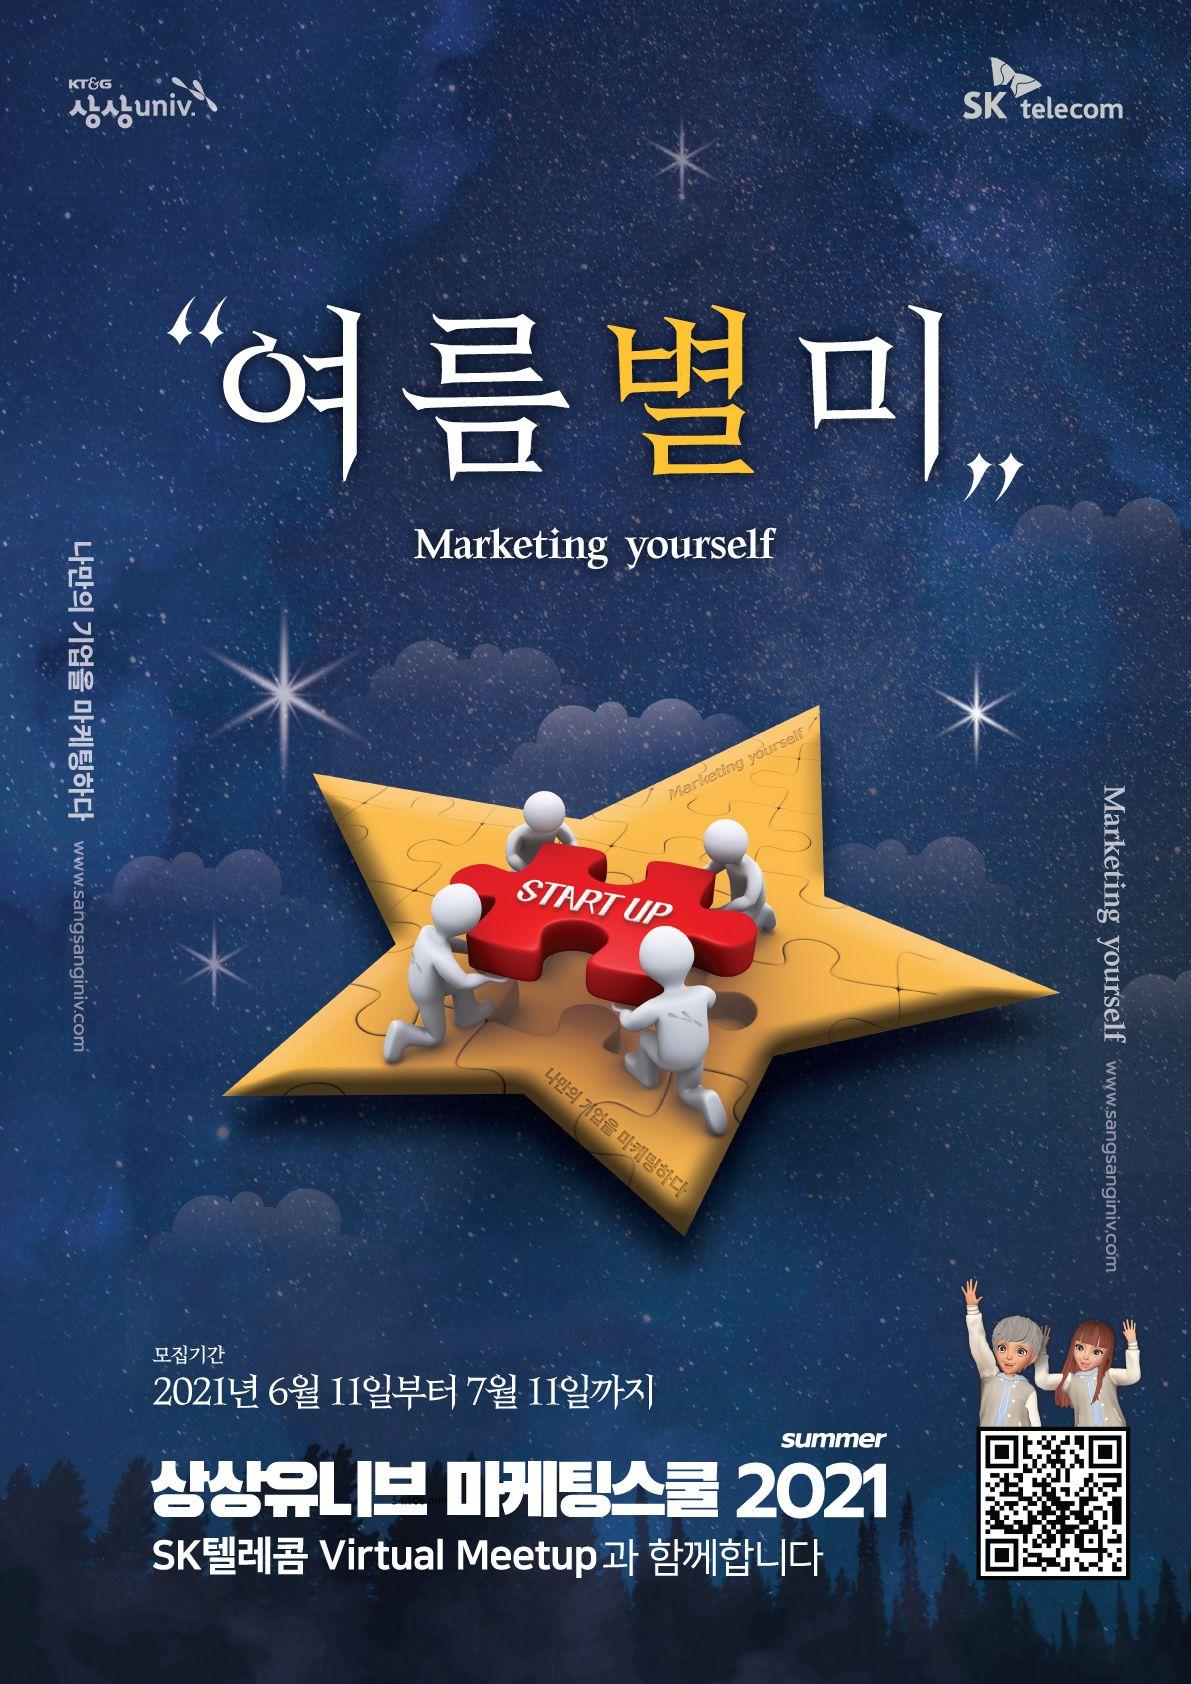 KT&G 상상univ 상상유니브 마케팅스쿨2021 summer 모집연장